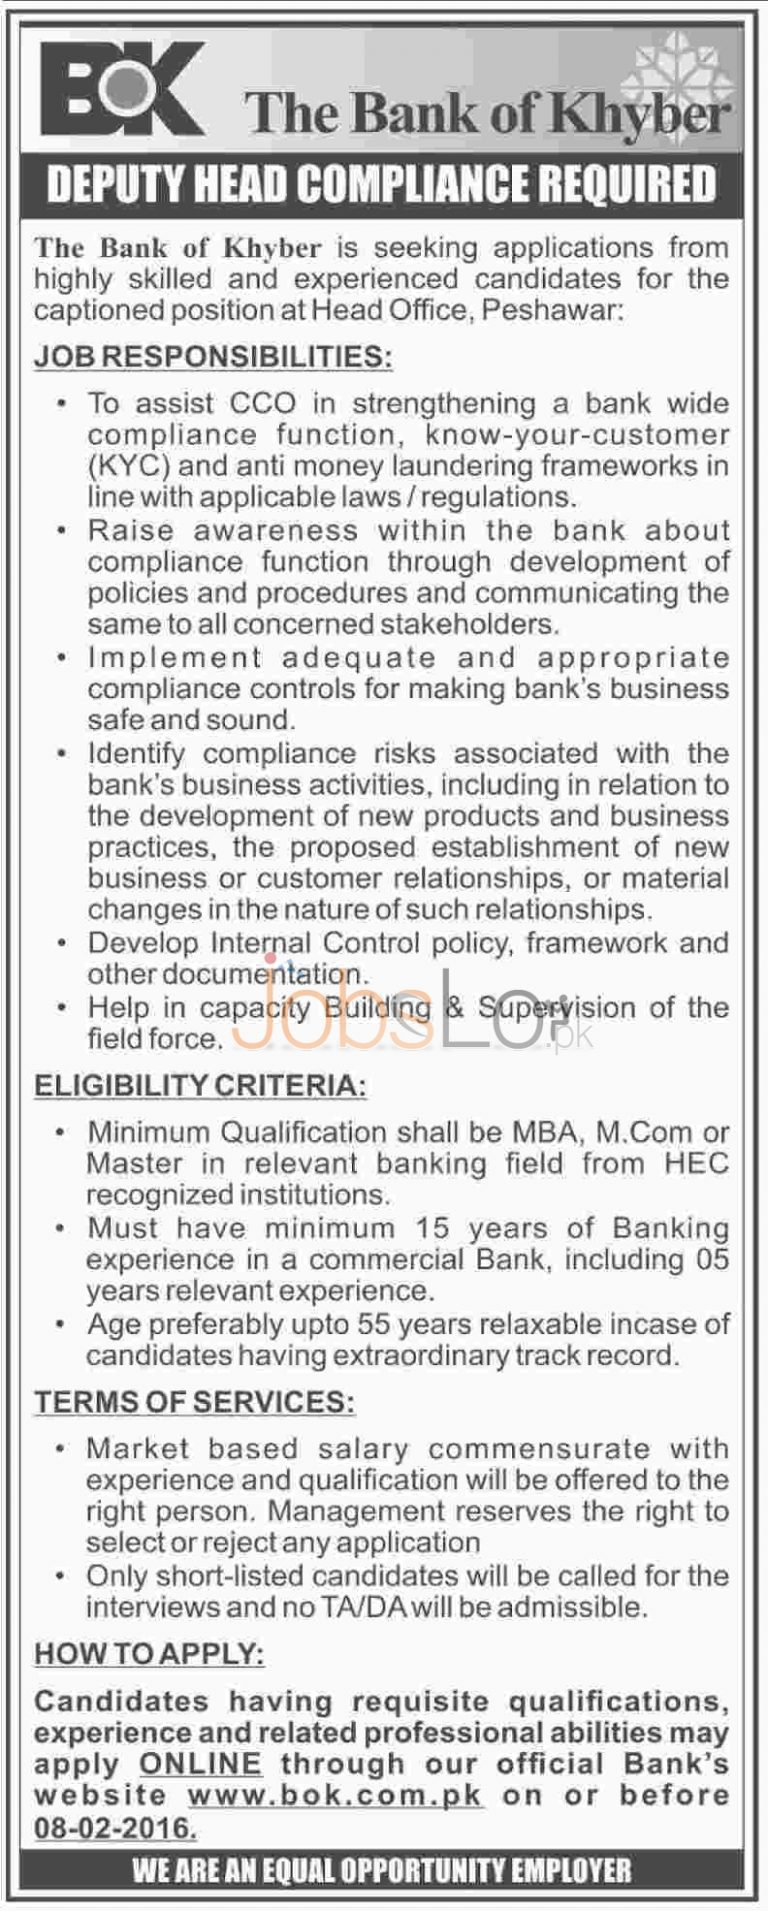 Bank of Khyber Jobs 2016 in Peshawar for Deputy Head Compliance